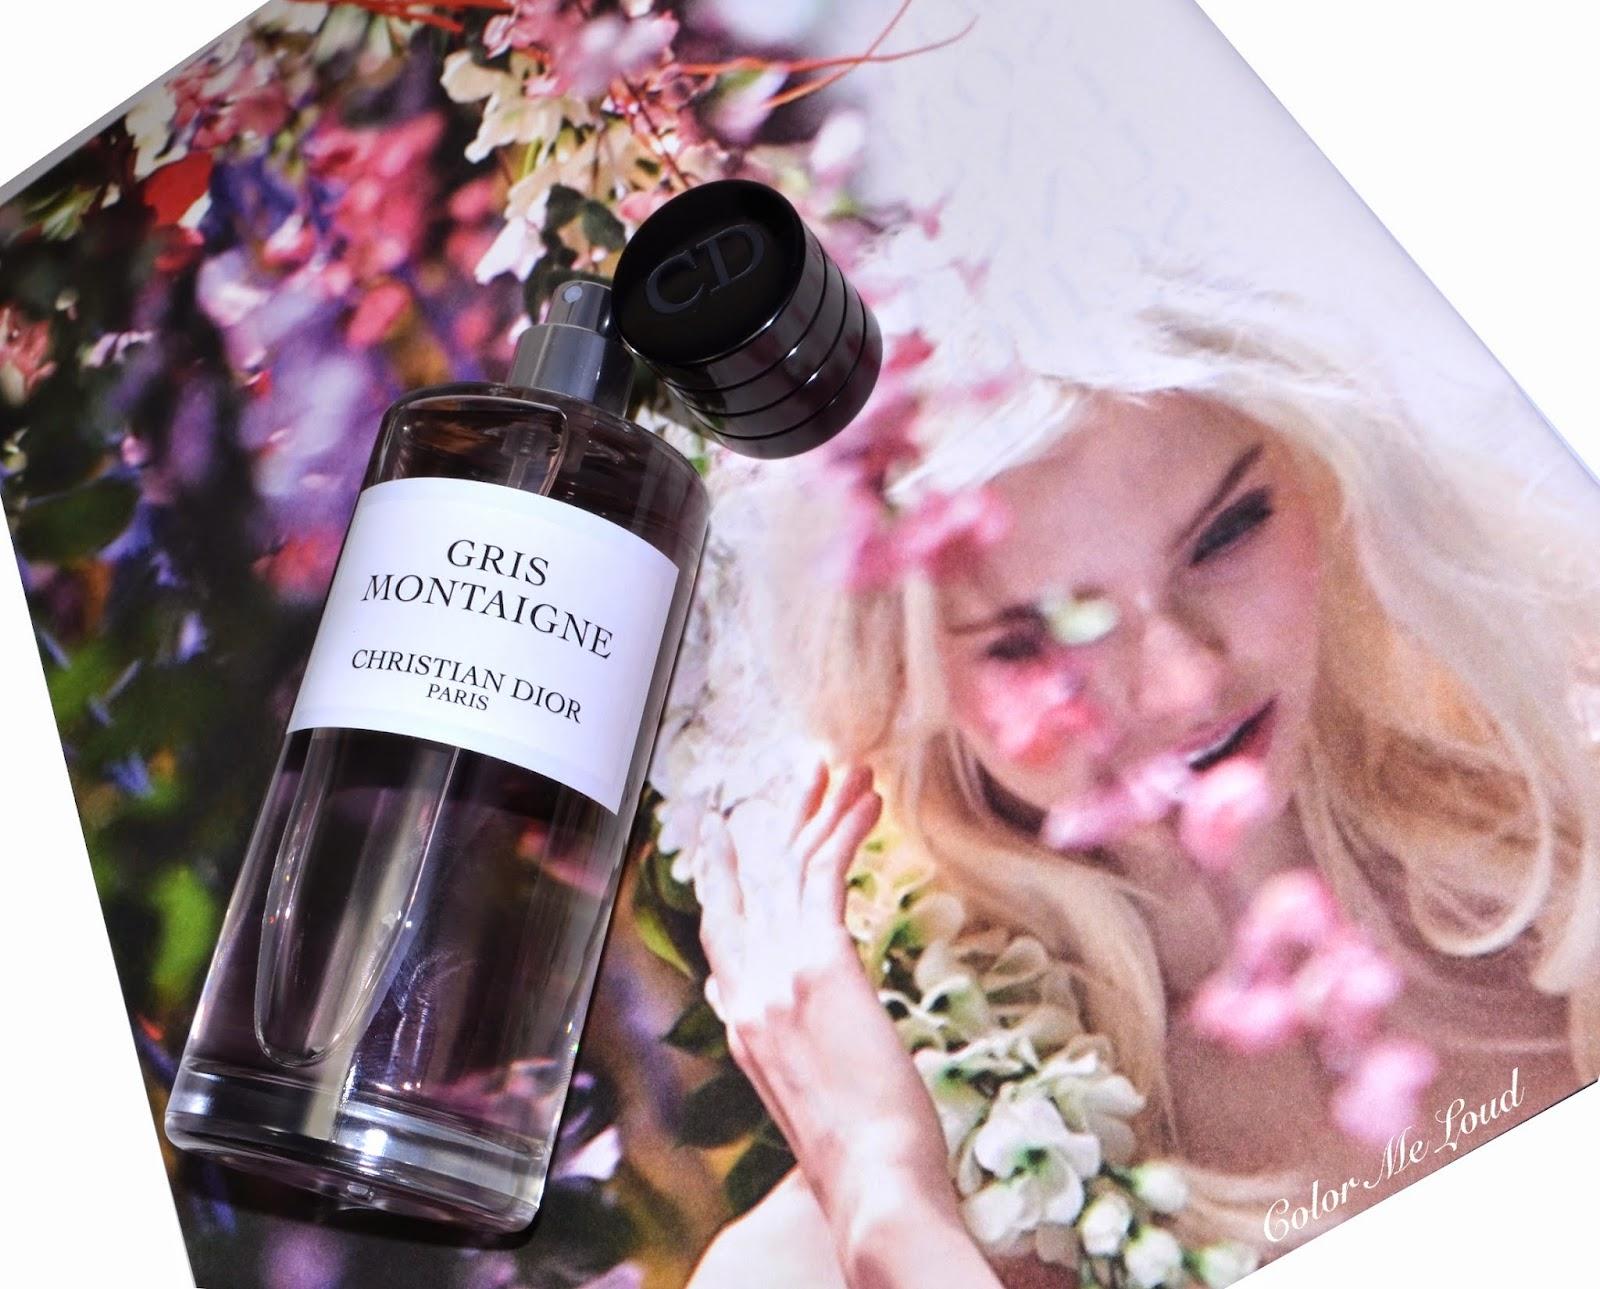 Gris Montaigne Christian Dior christian dior gris montaigne eau de perfum for collection